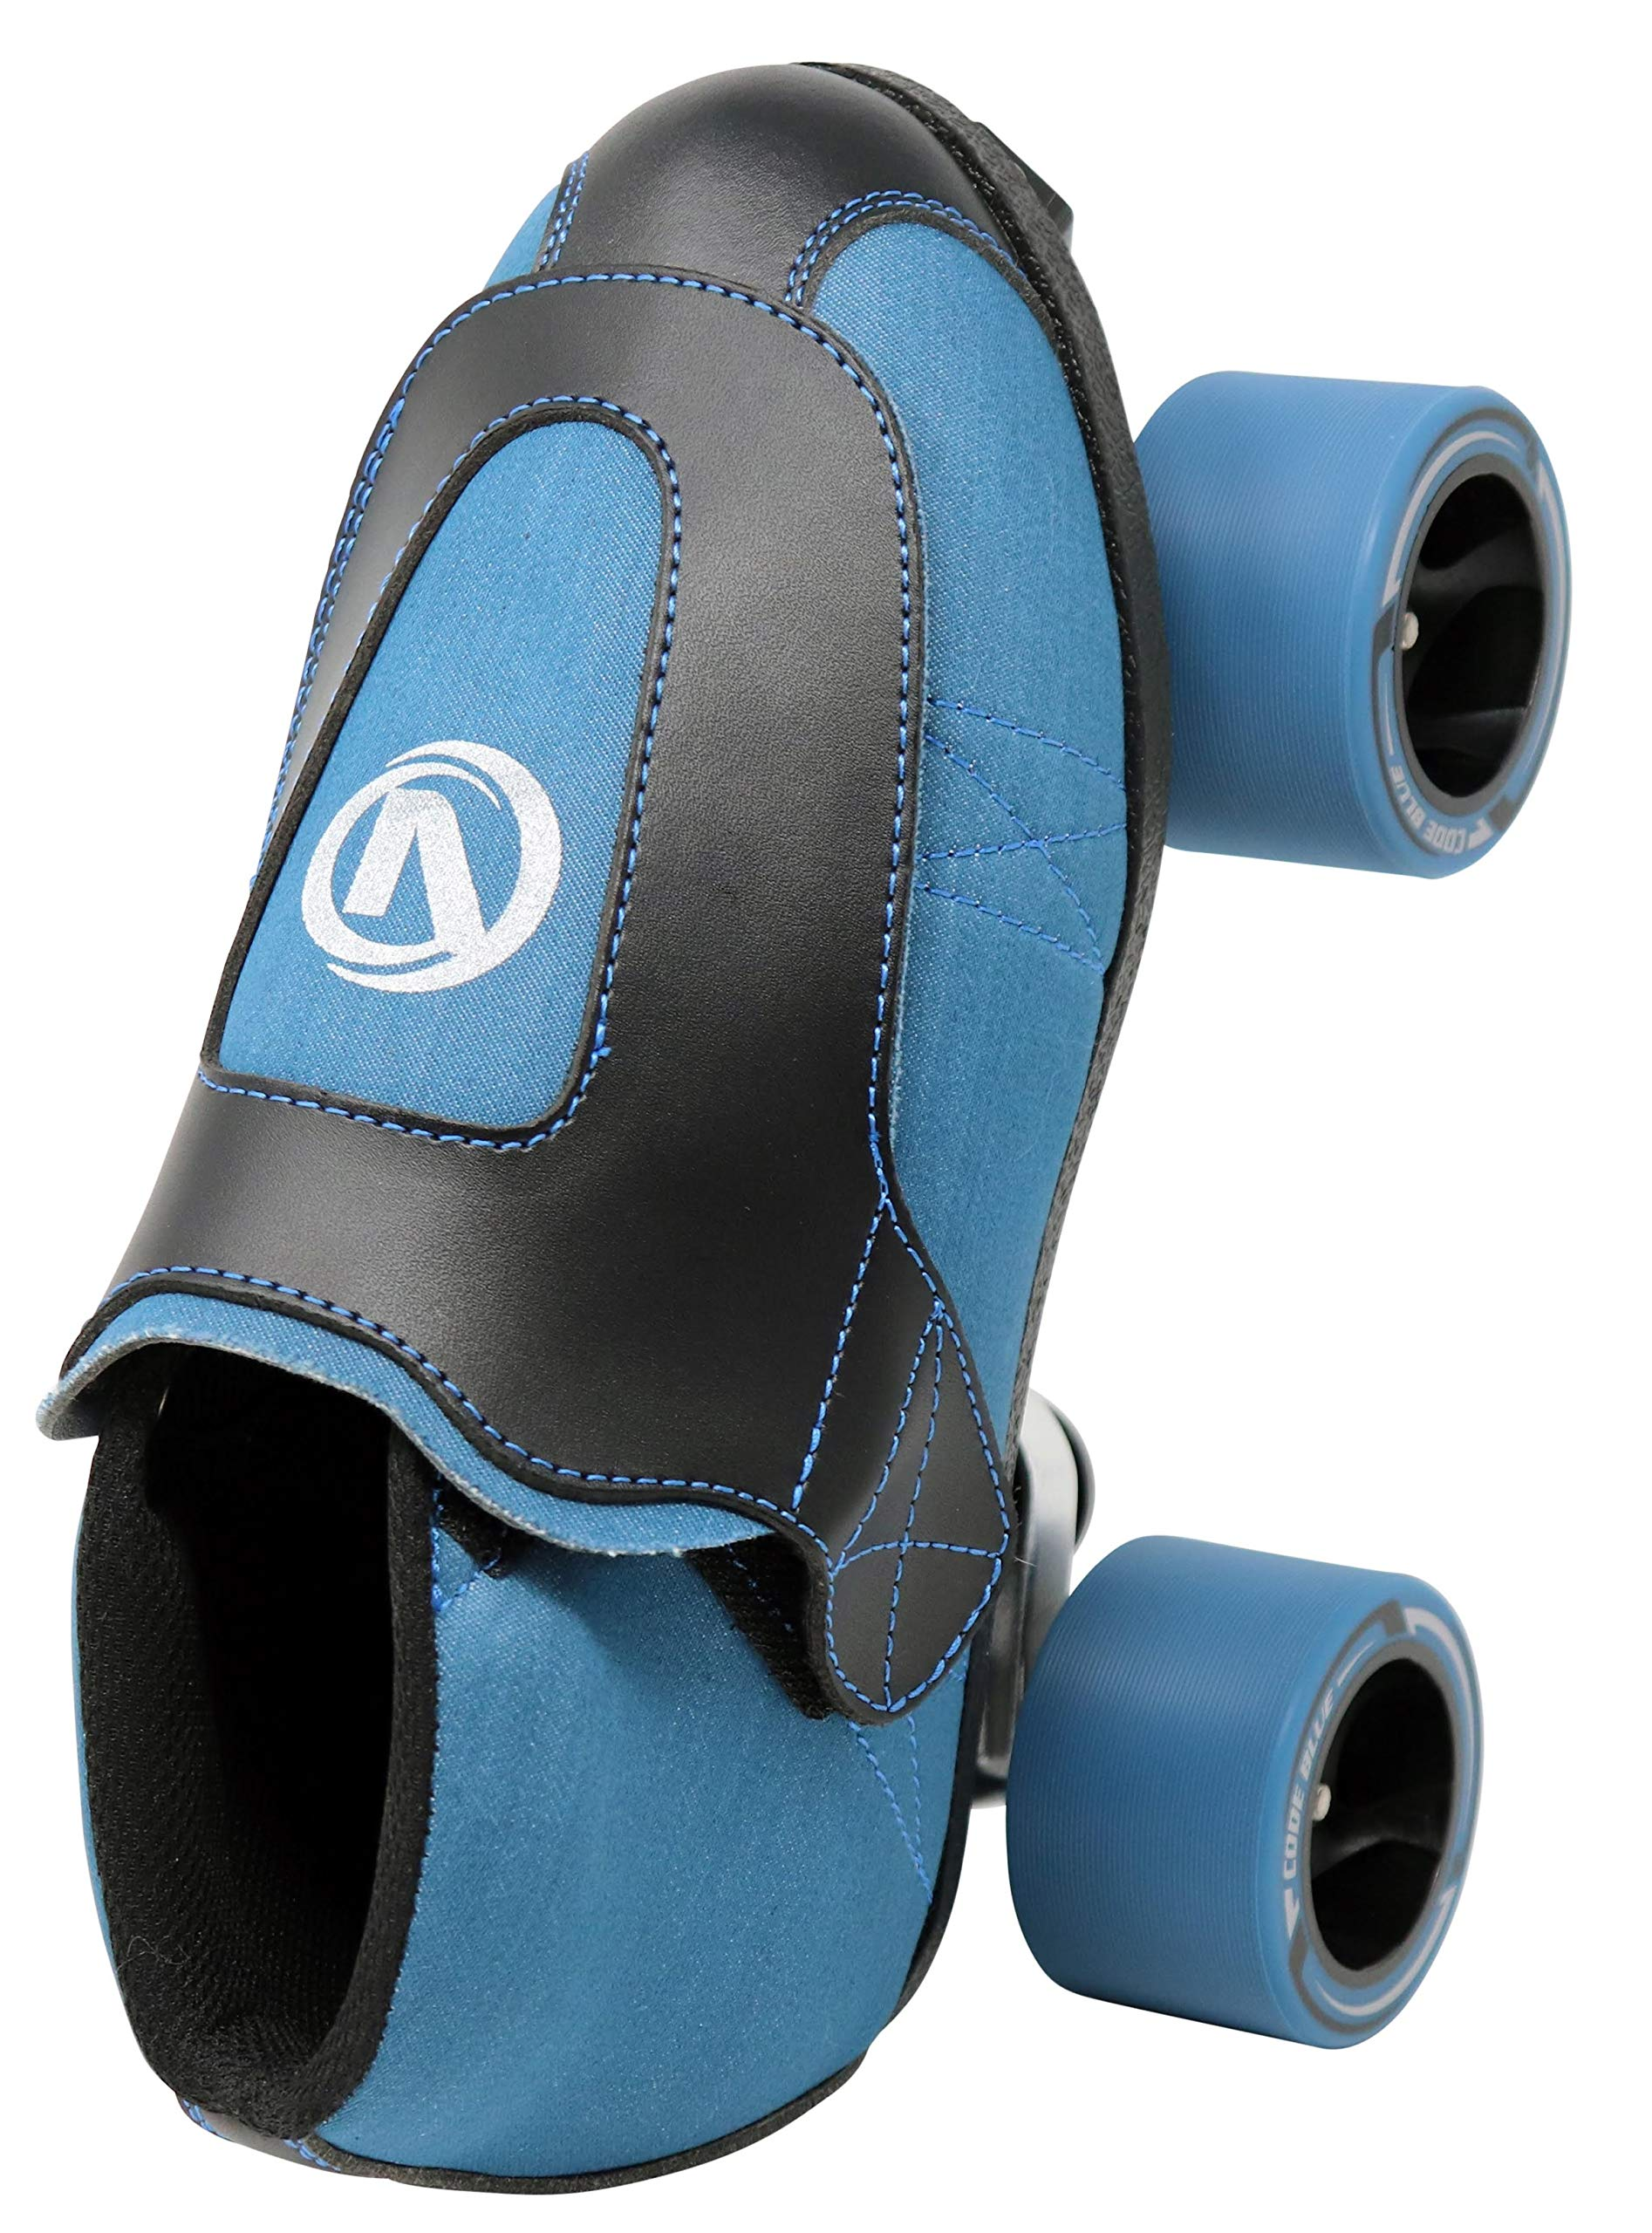 VNLA Code Blue Jam Skate - Mens & Womens Speed Skates - Quad Skates for Women & Men - Adjustable Roller Skate/Rollerskates - Outdoor & Indoor Adult Quad Skate - Kid/Kids Roller Skates (Size 6) by VNLA (Image #4)